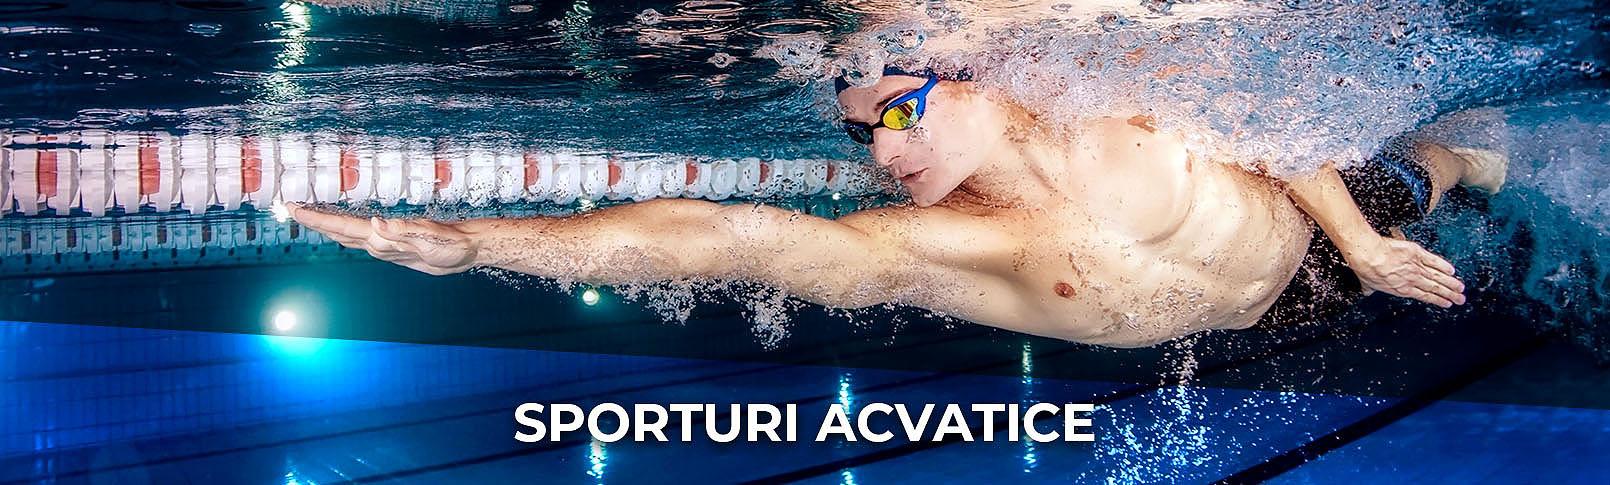 sporturi acvatice